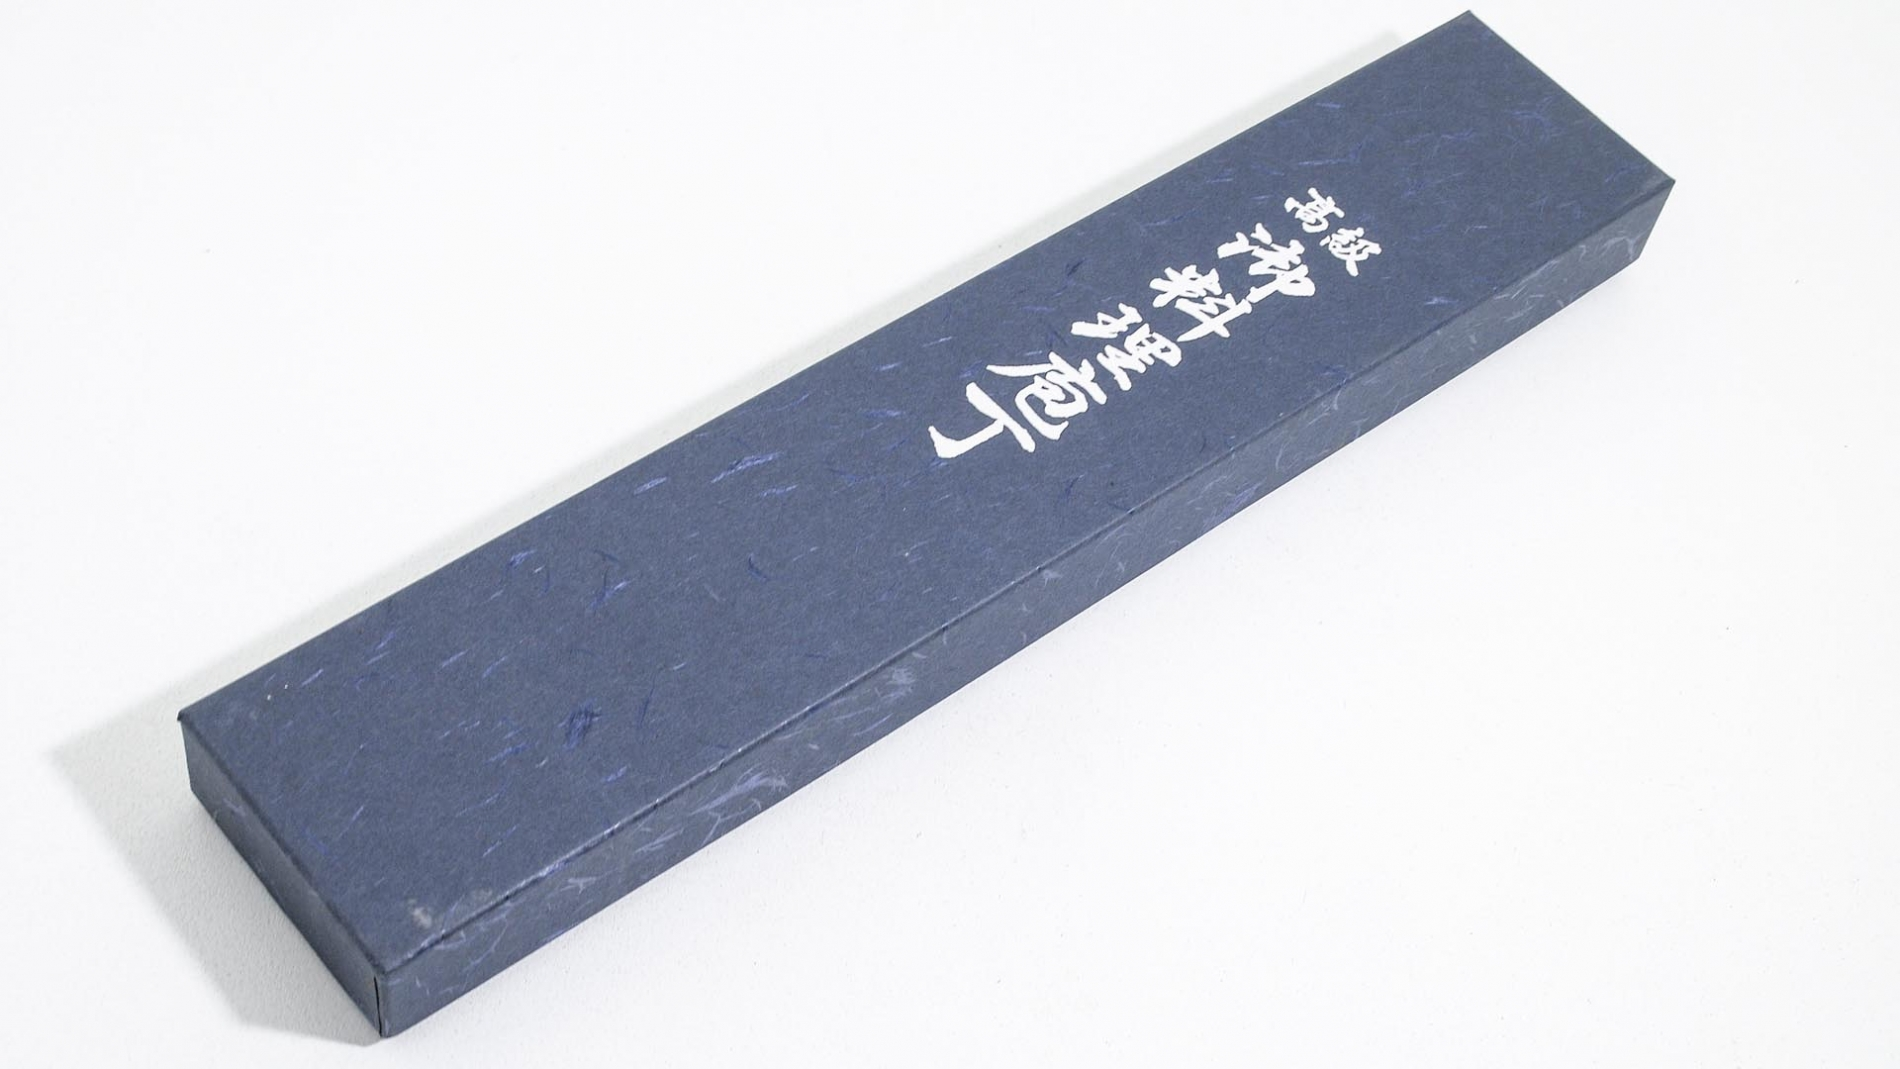 BS-16905-Cuchillo Santoku 165mm Aogami Blue Super+clad inox Kurouchi BS-16905-max-7.